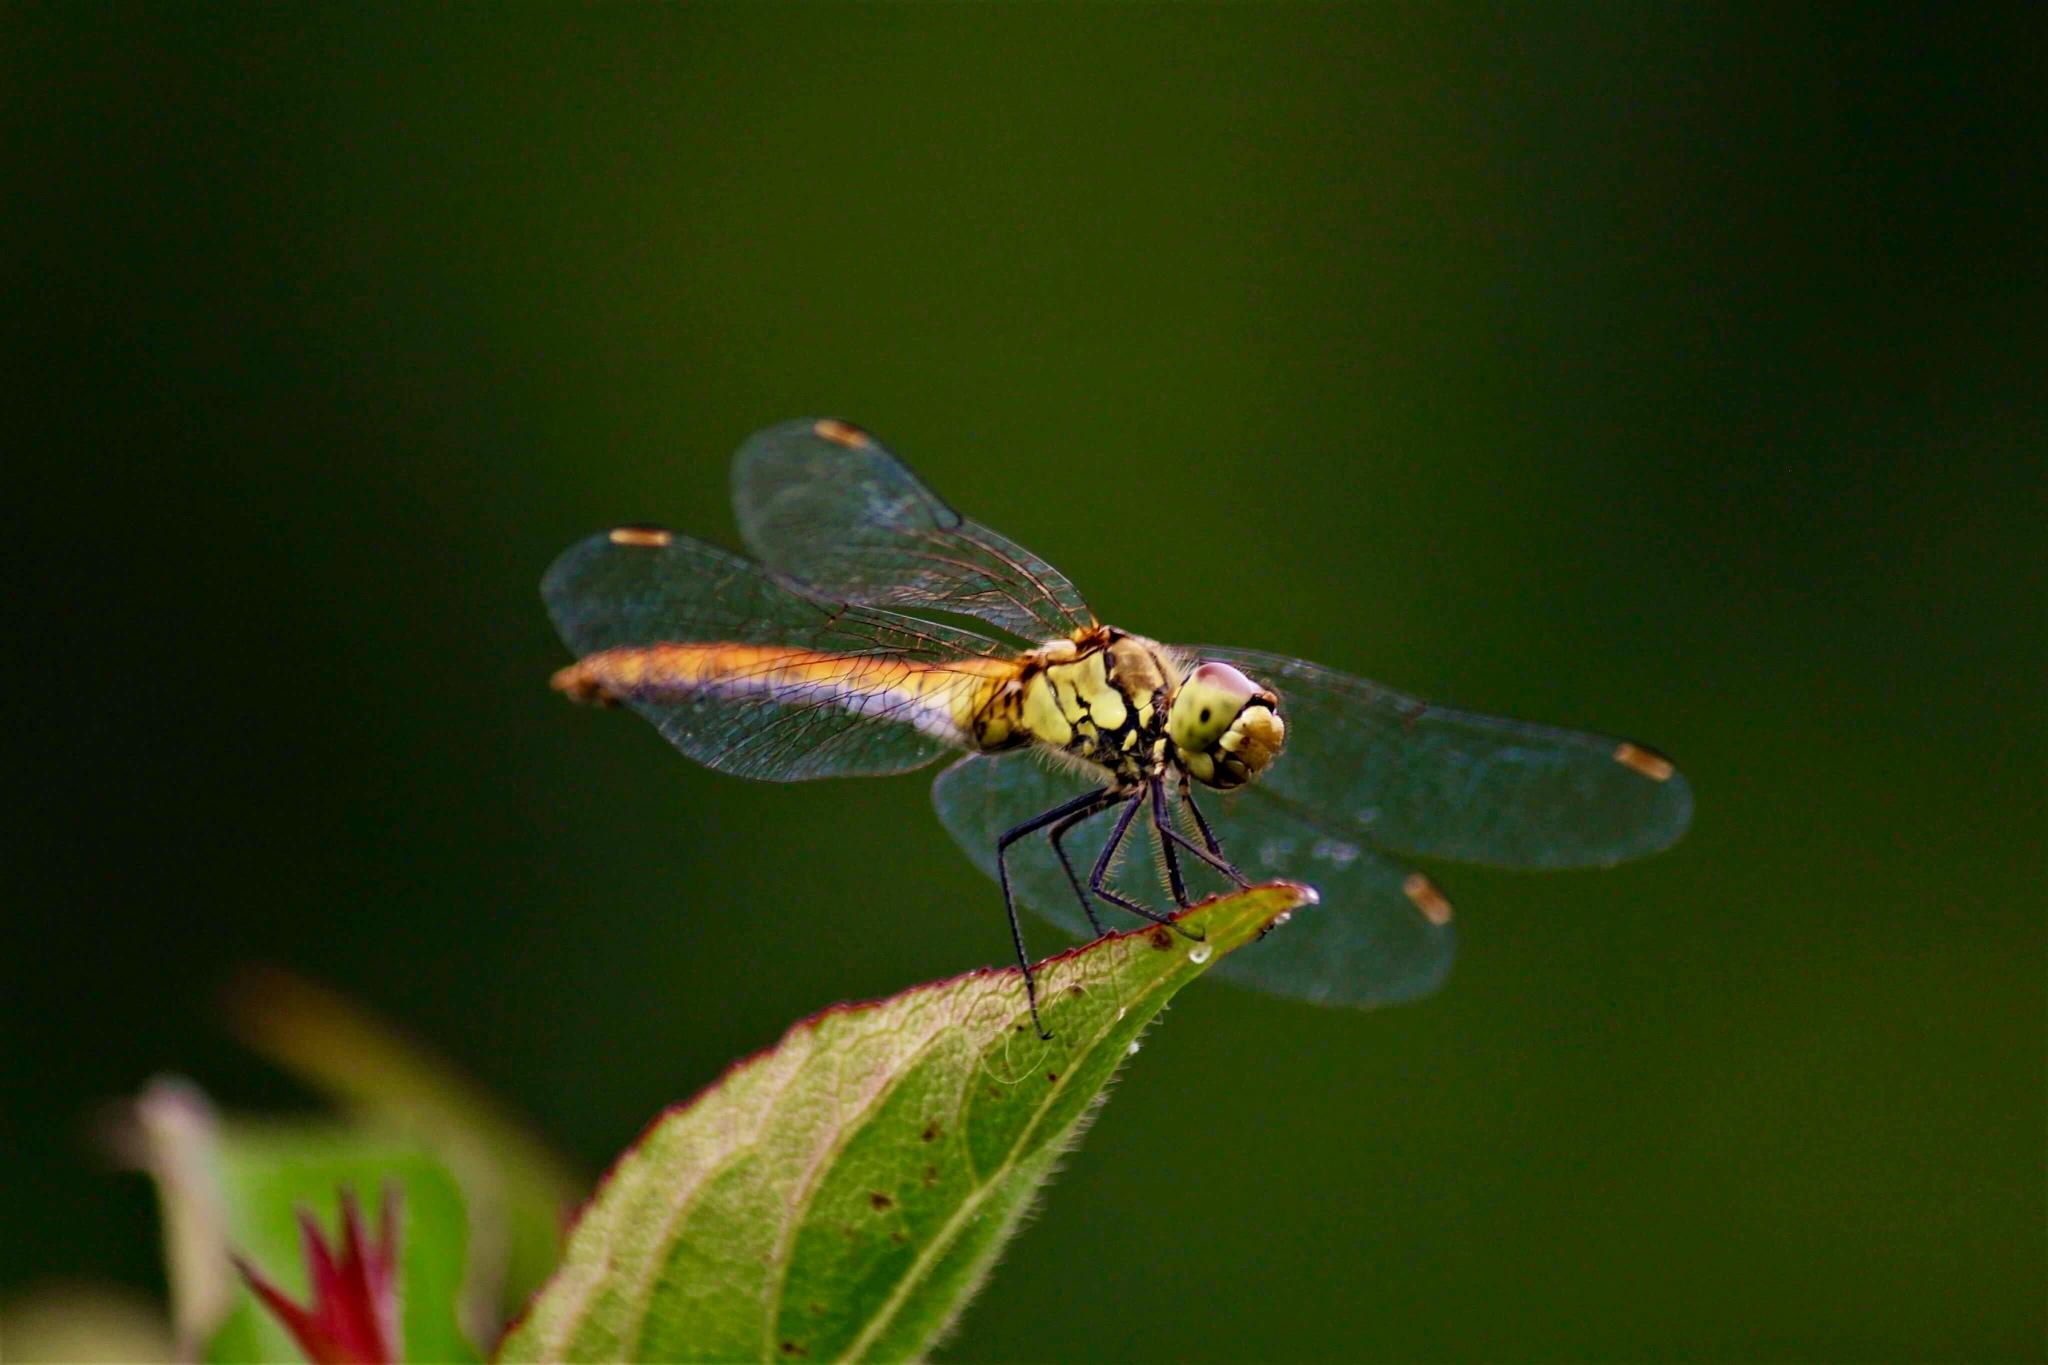 Dragonfly by Sáfrány Mónika